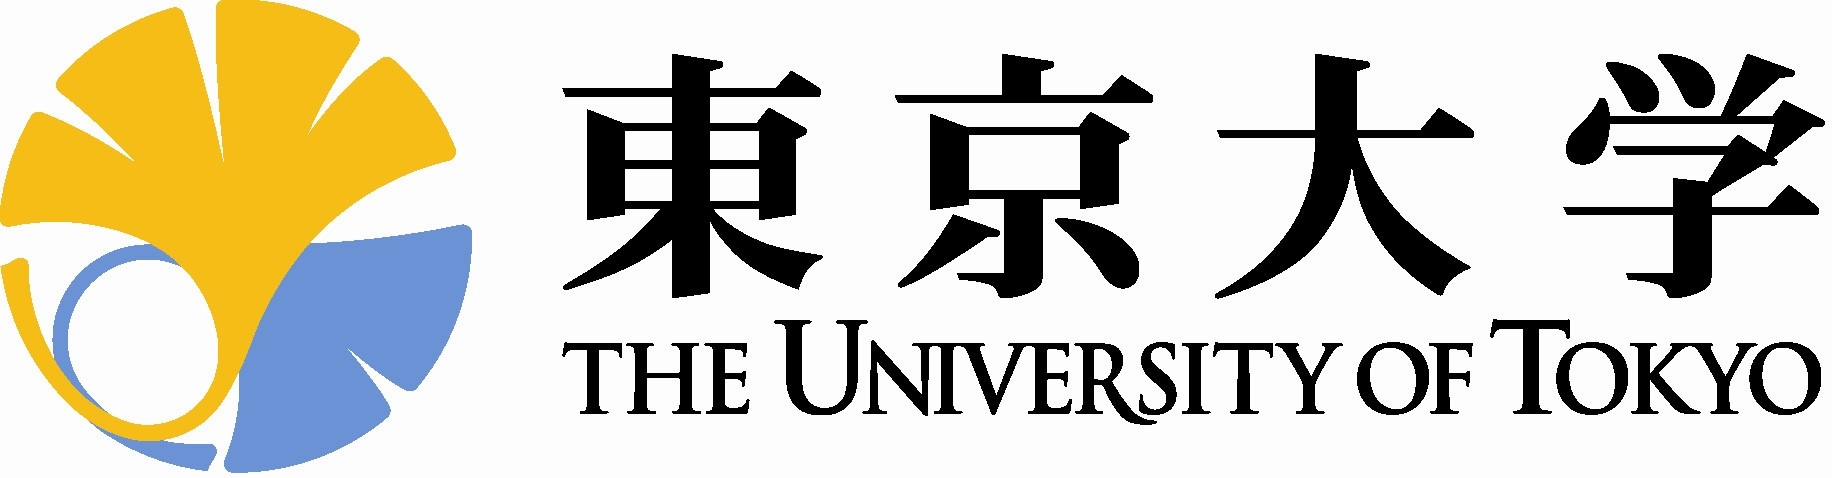 TokyoUni_logo.jpg